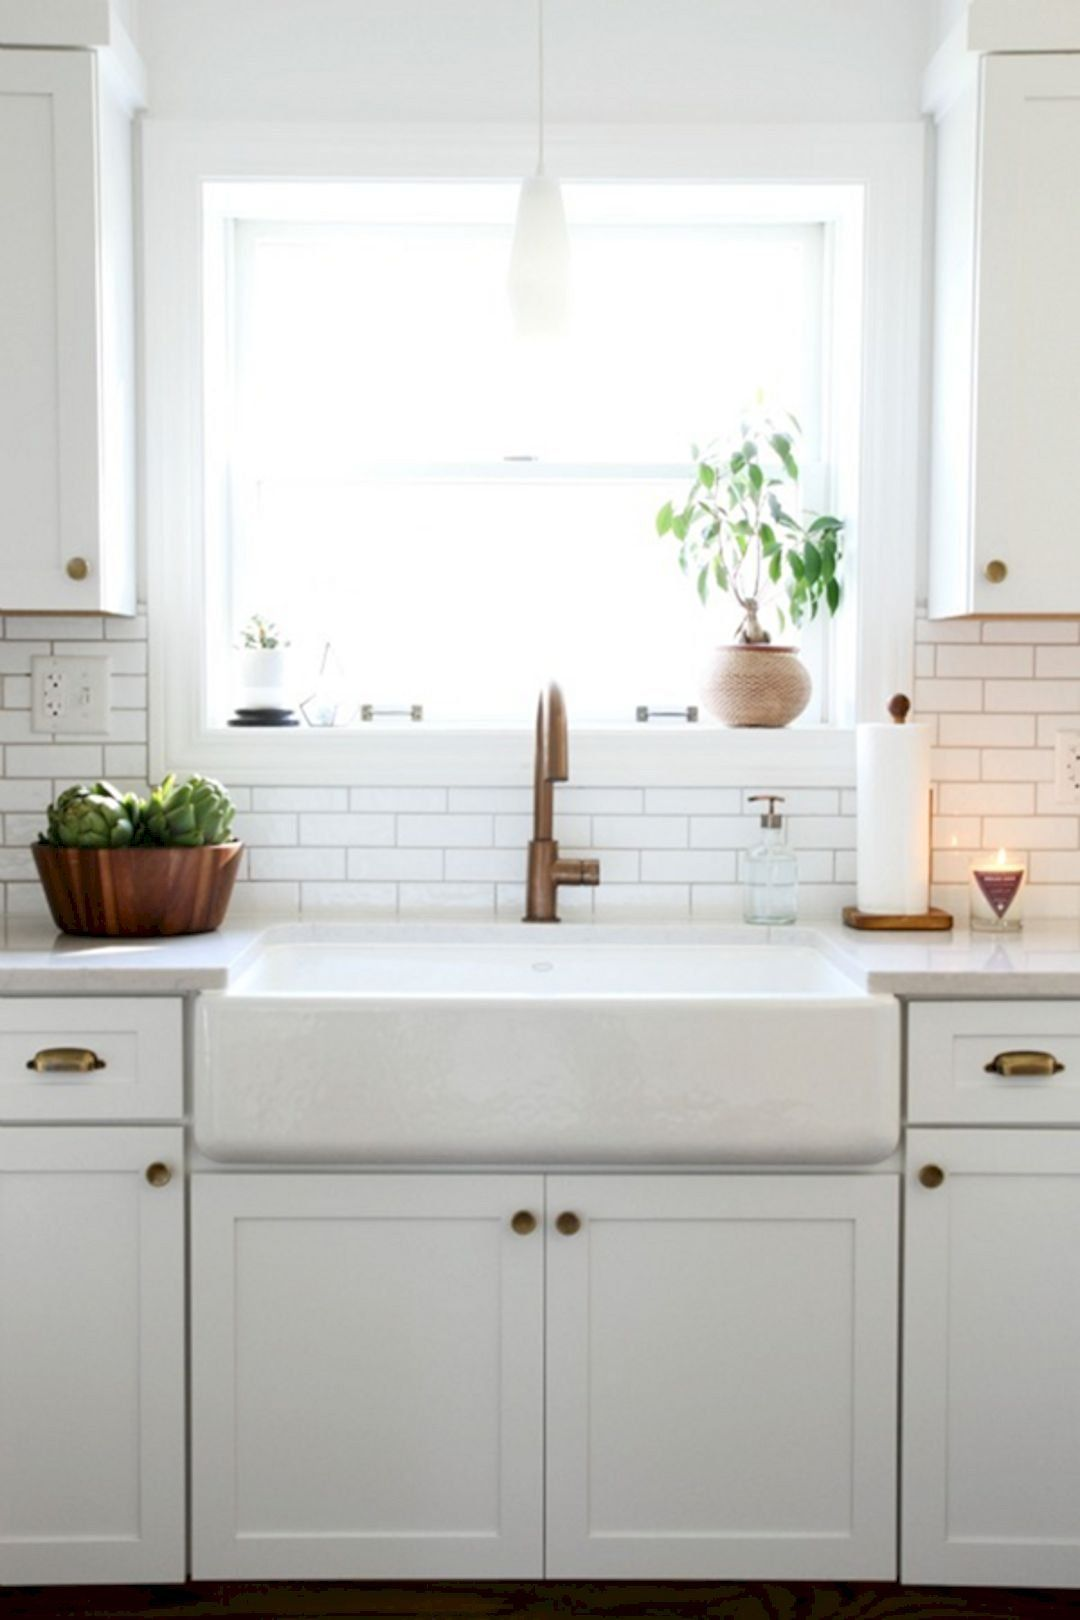 Download Wallpaper White Vintage Style Kitchen Sink